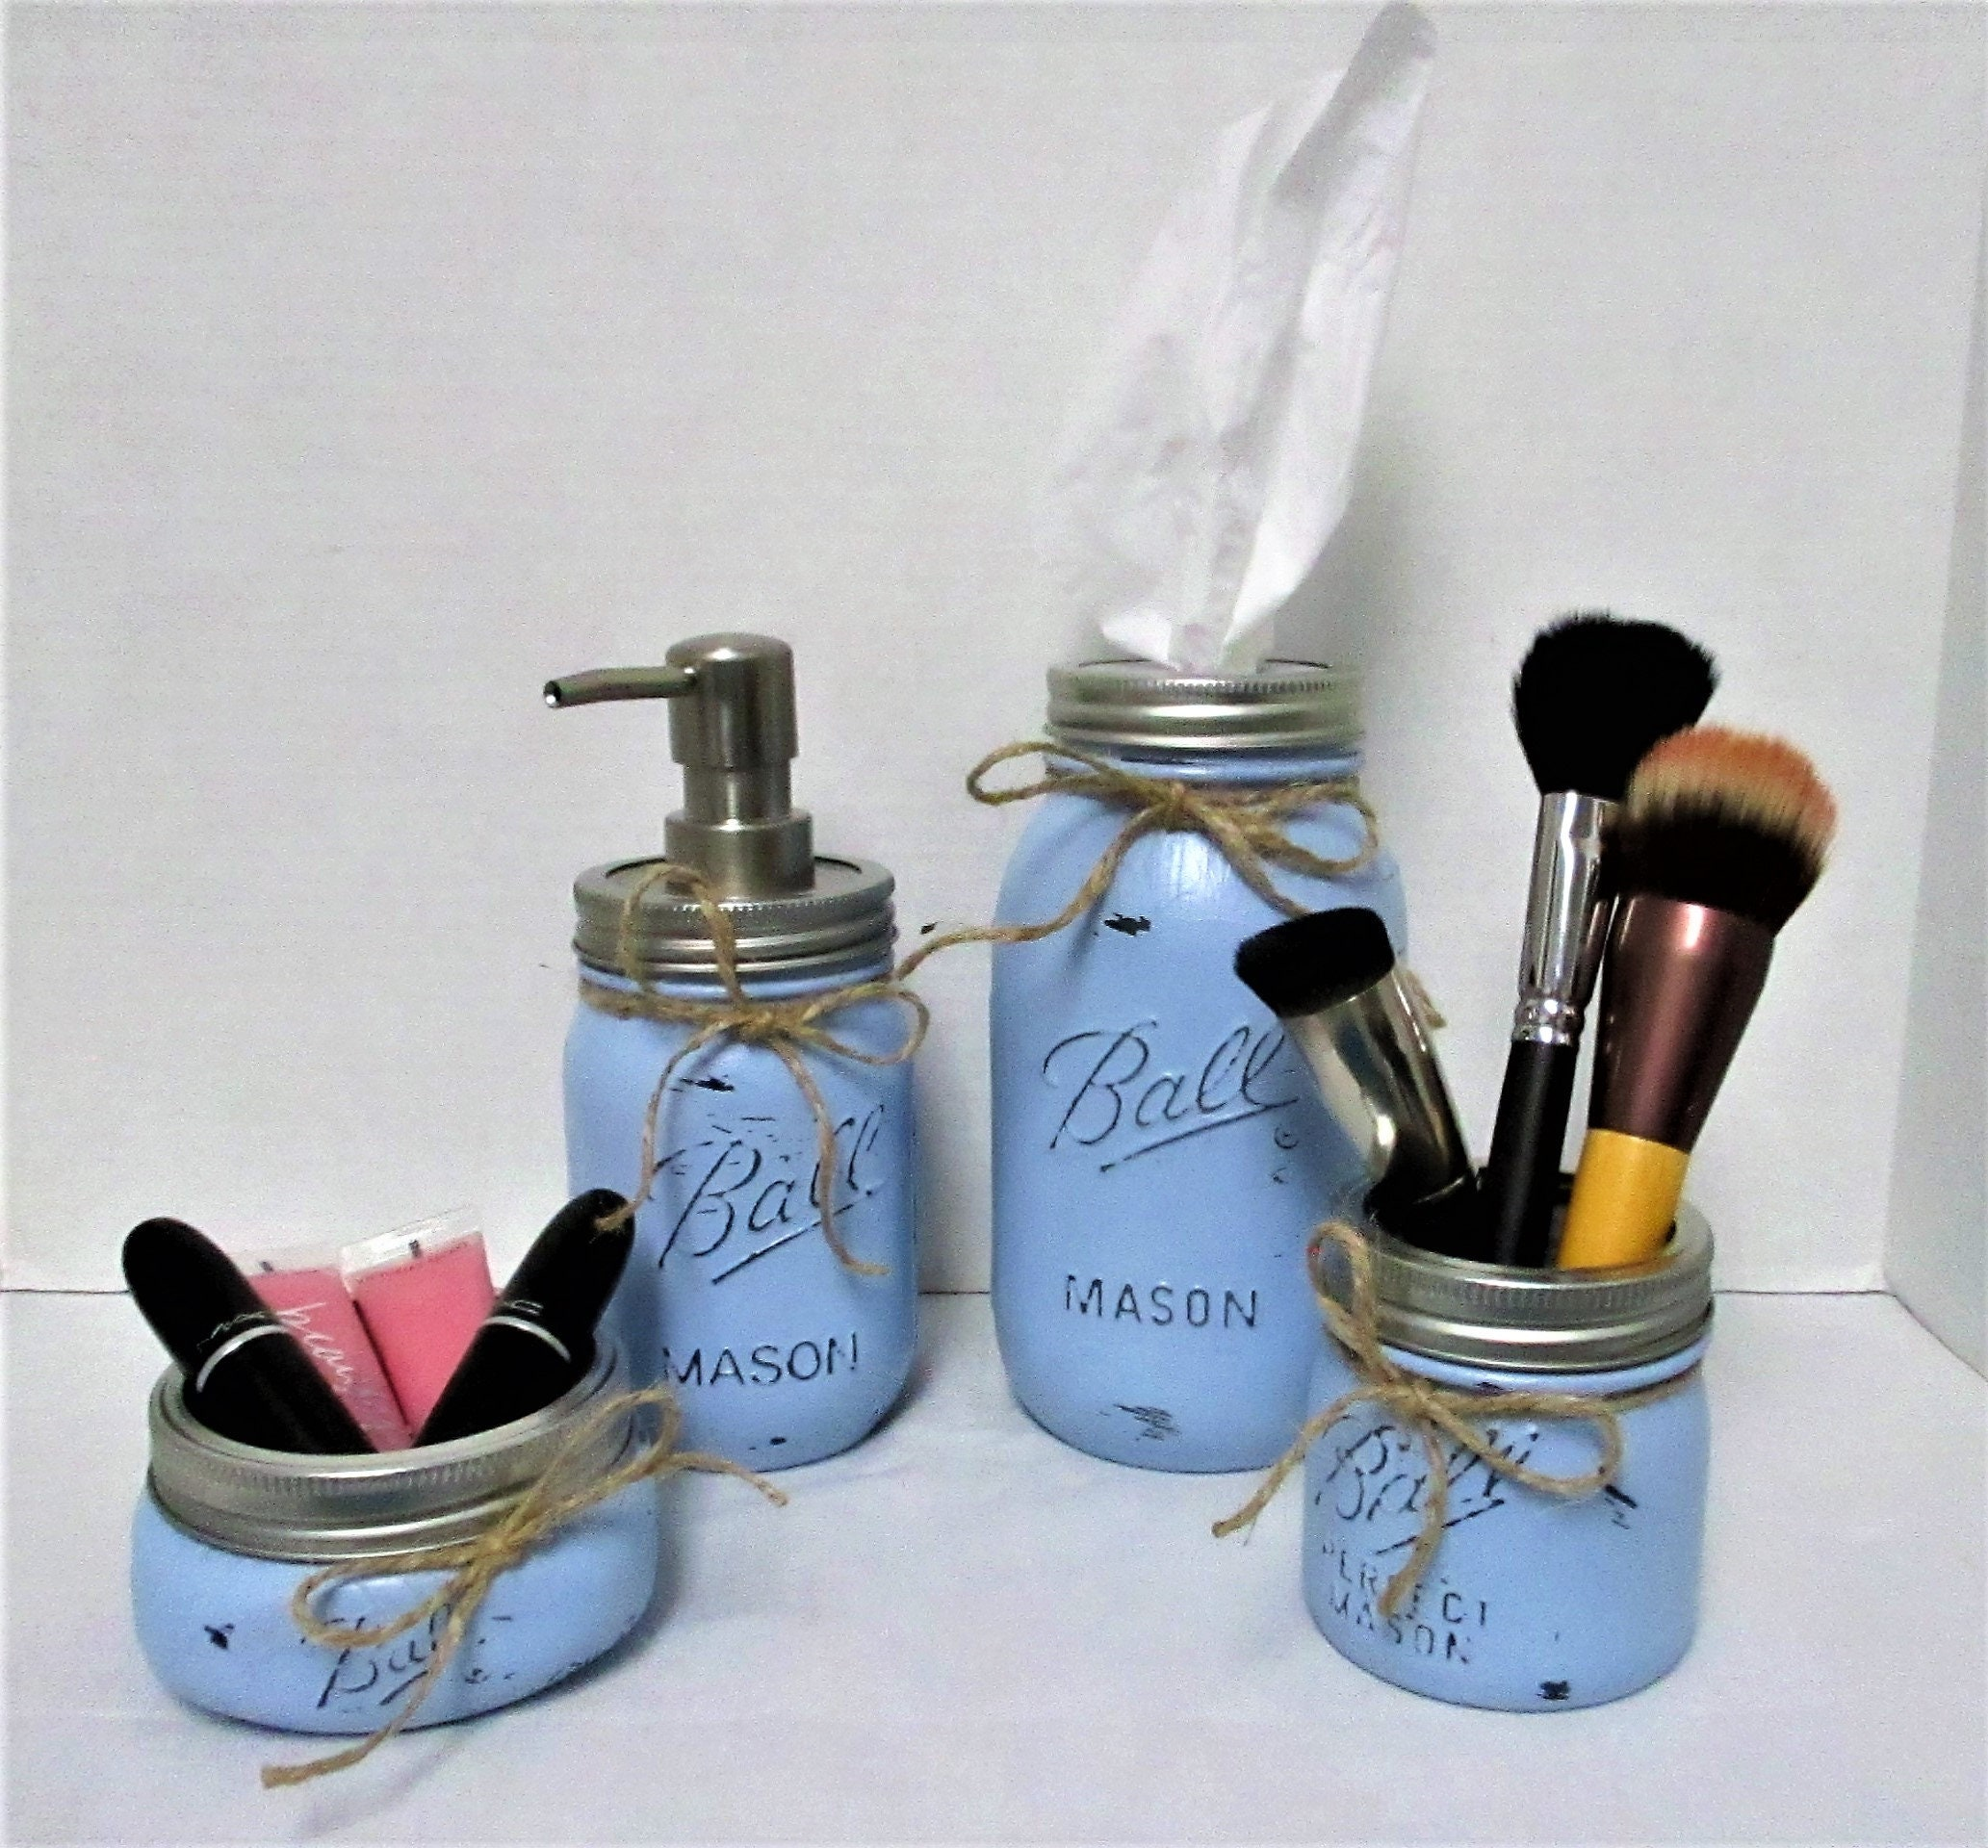 Mason Jar Bathroom Set Blue Bathroom Set Desk Accessories Vanity Set Country Chic Wedding Gift Farmhouse Bathroom Shabby Chic Blue,Where To Find Houses For Rent